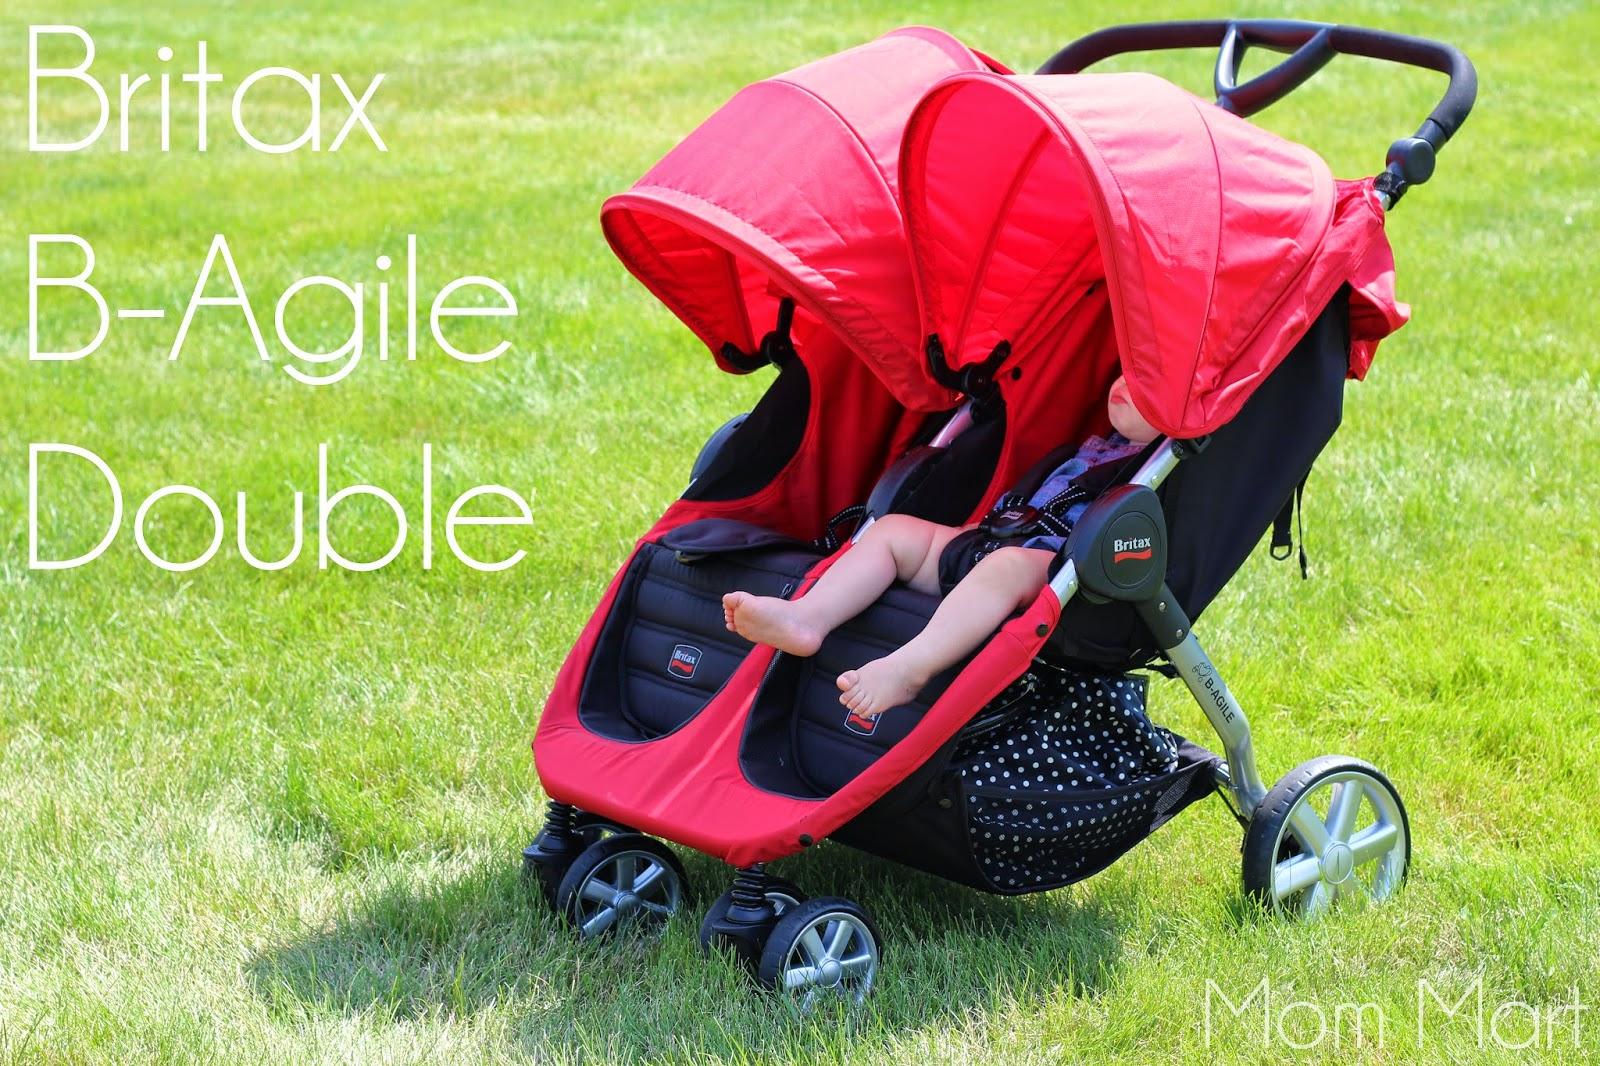 Britax BAgile Double Stroller Review #DoubleStroller #BritaxBAgile